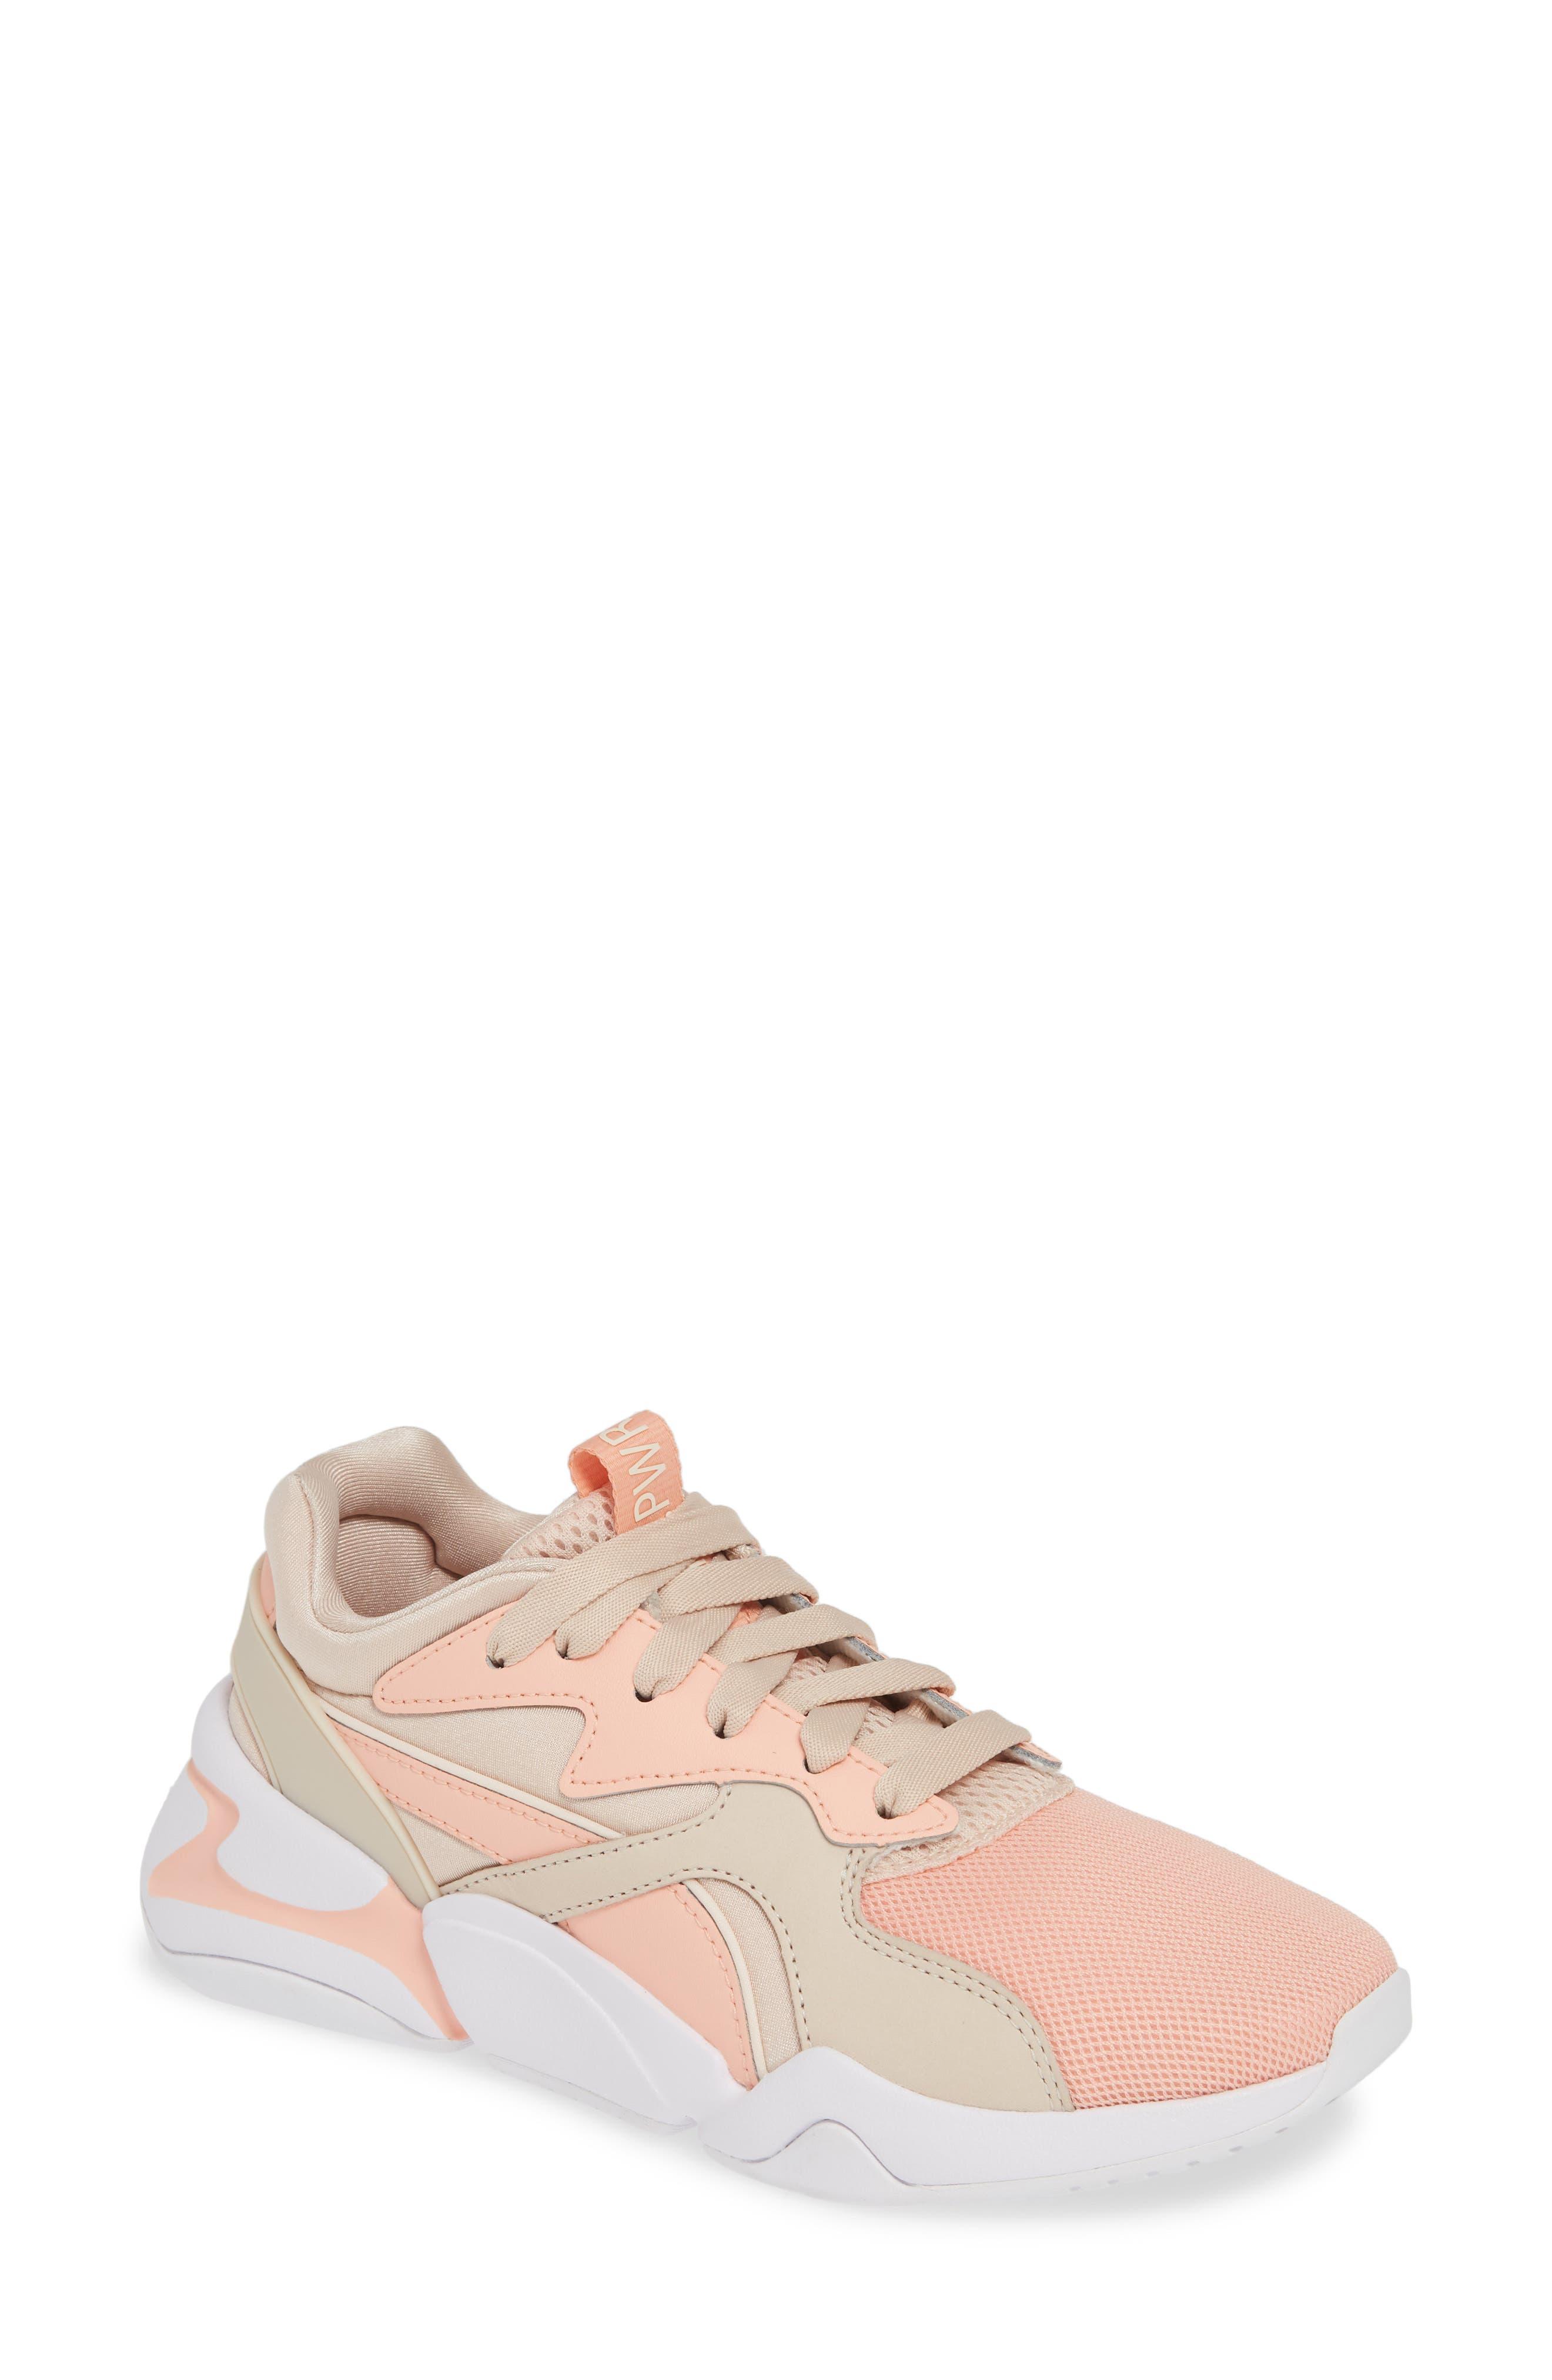 PUMA, Nova GRL PWR Sneaker, Main thumbnail 1, color, PEACH BUD/ PEARL BLUSH